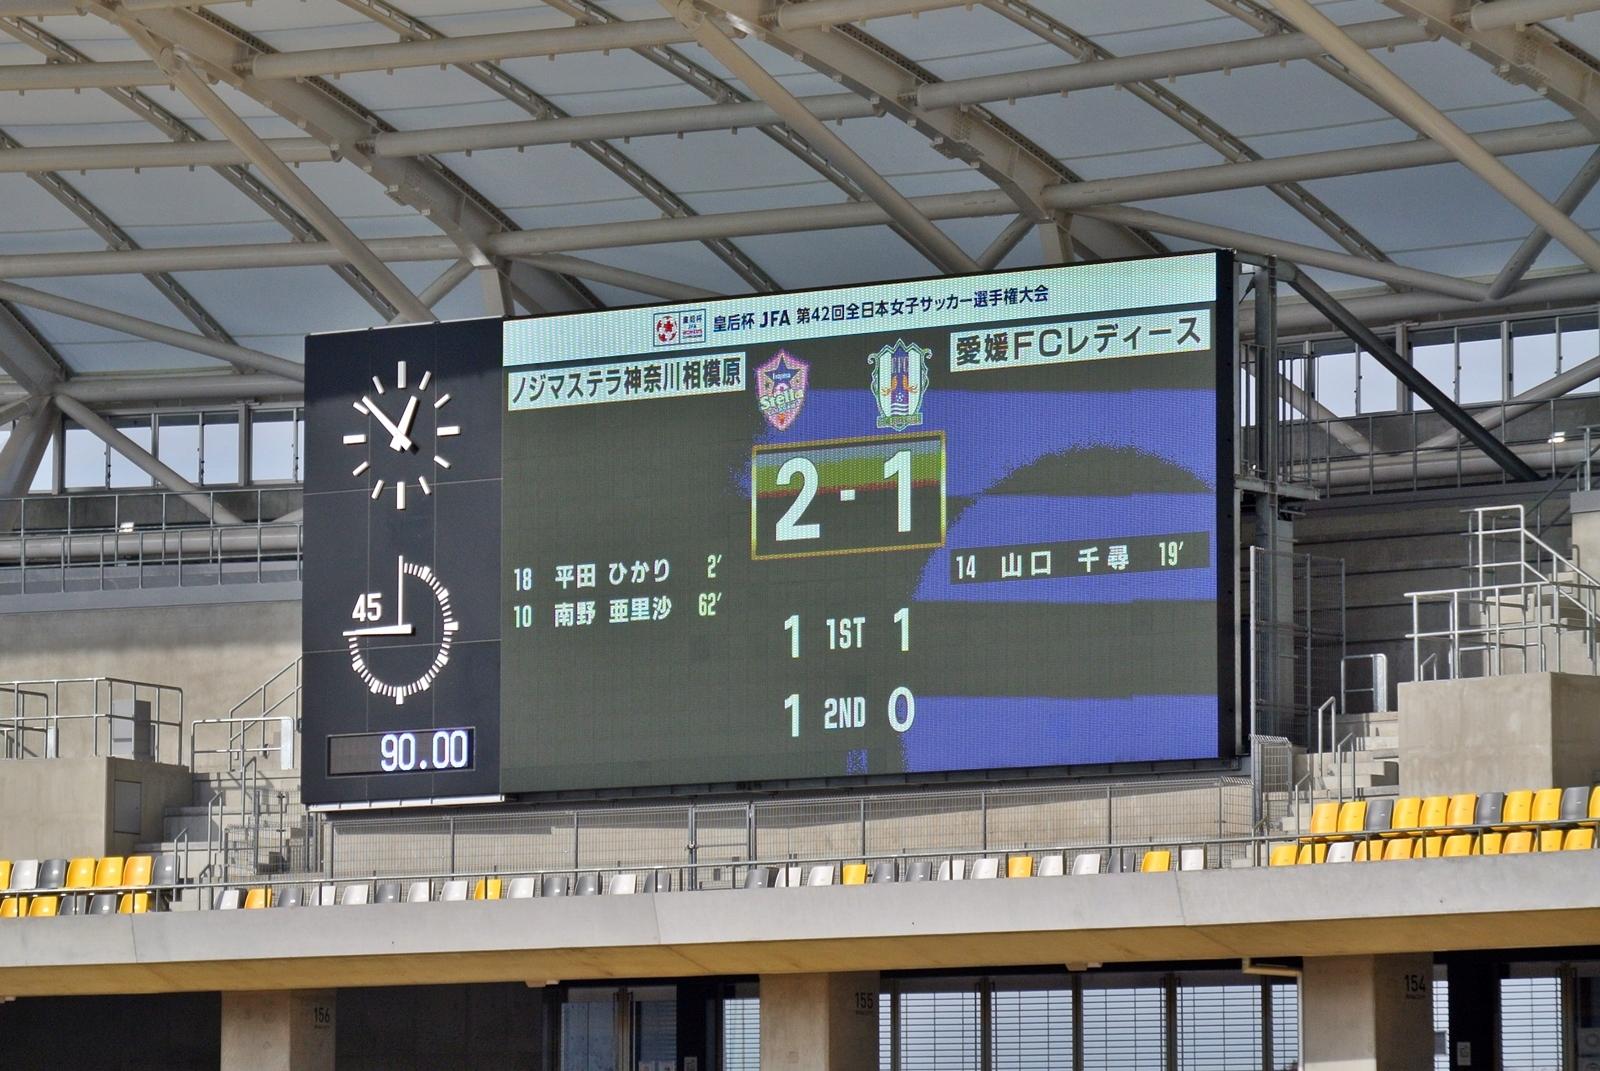 Fc 掲示板 愛媛 えひめサッカーフェスティバル2021無観客にて開催のお知らせ